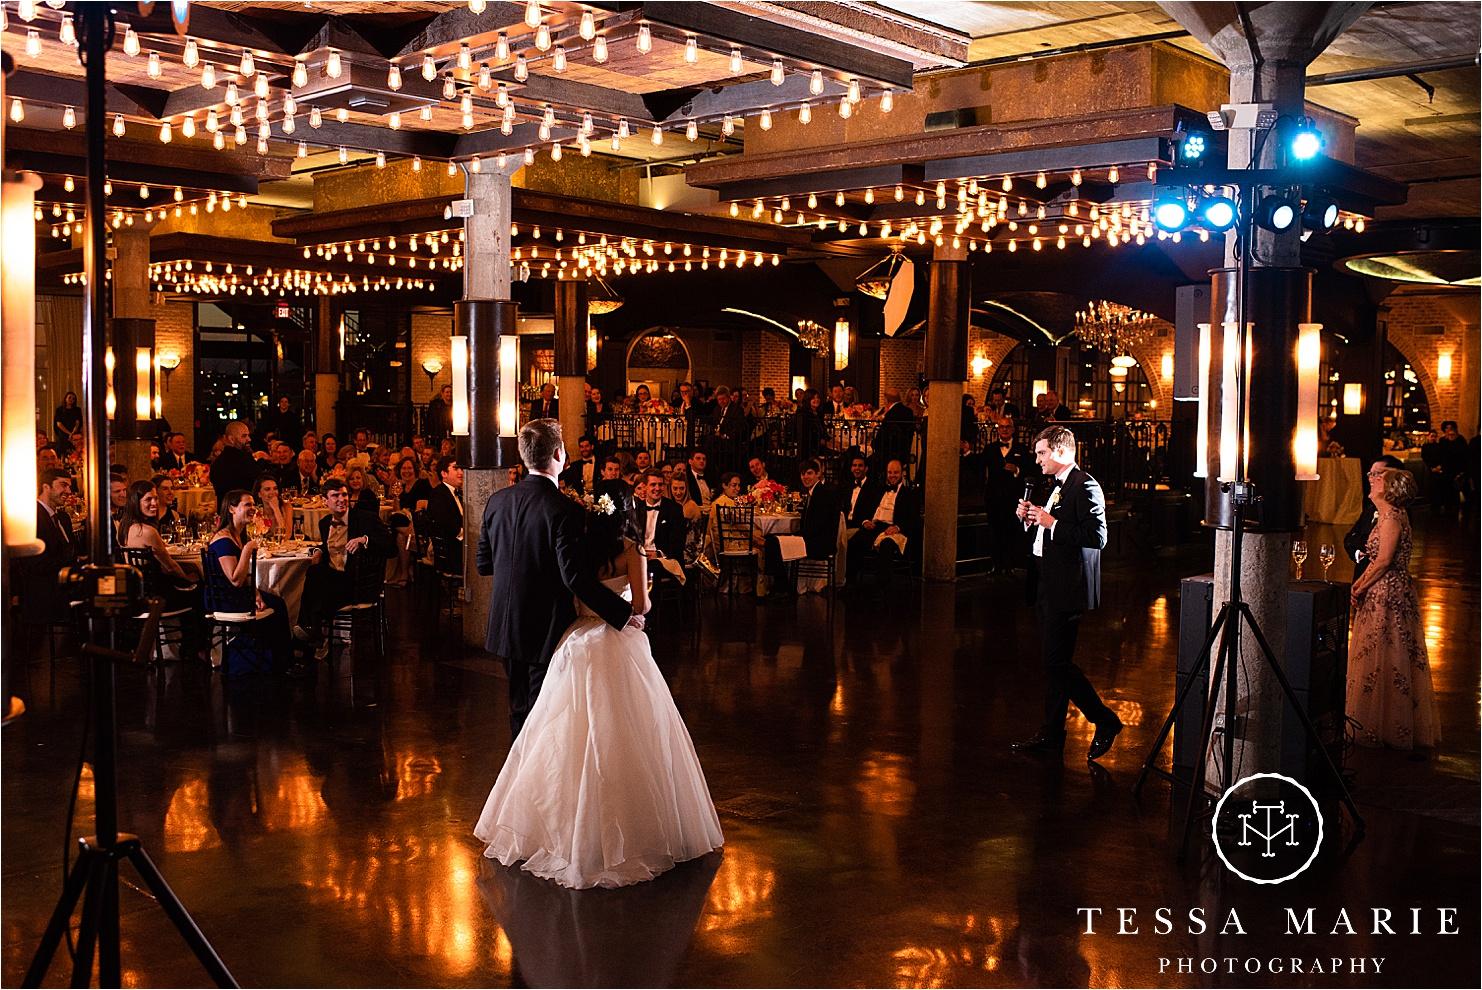 Tessa_marie_weddings_houston_wedding_photographer_The_astorian_0159.jpg